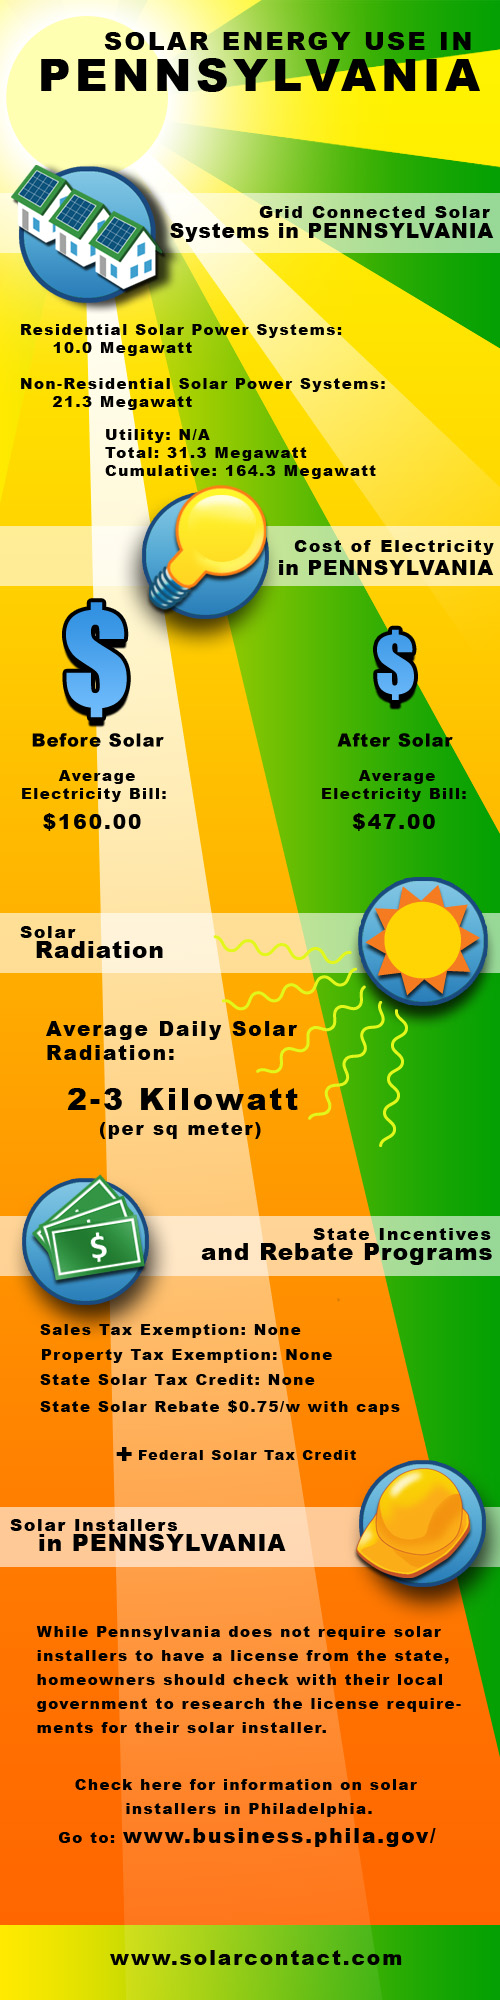 Fact Sheet Solar Energy Use in Pennsylvania